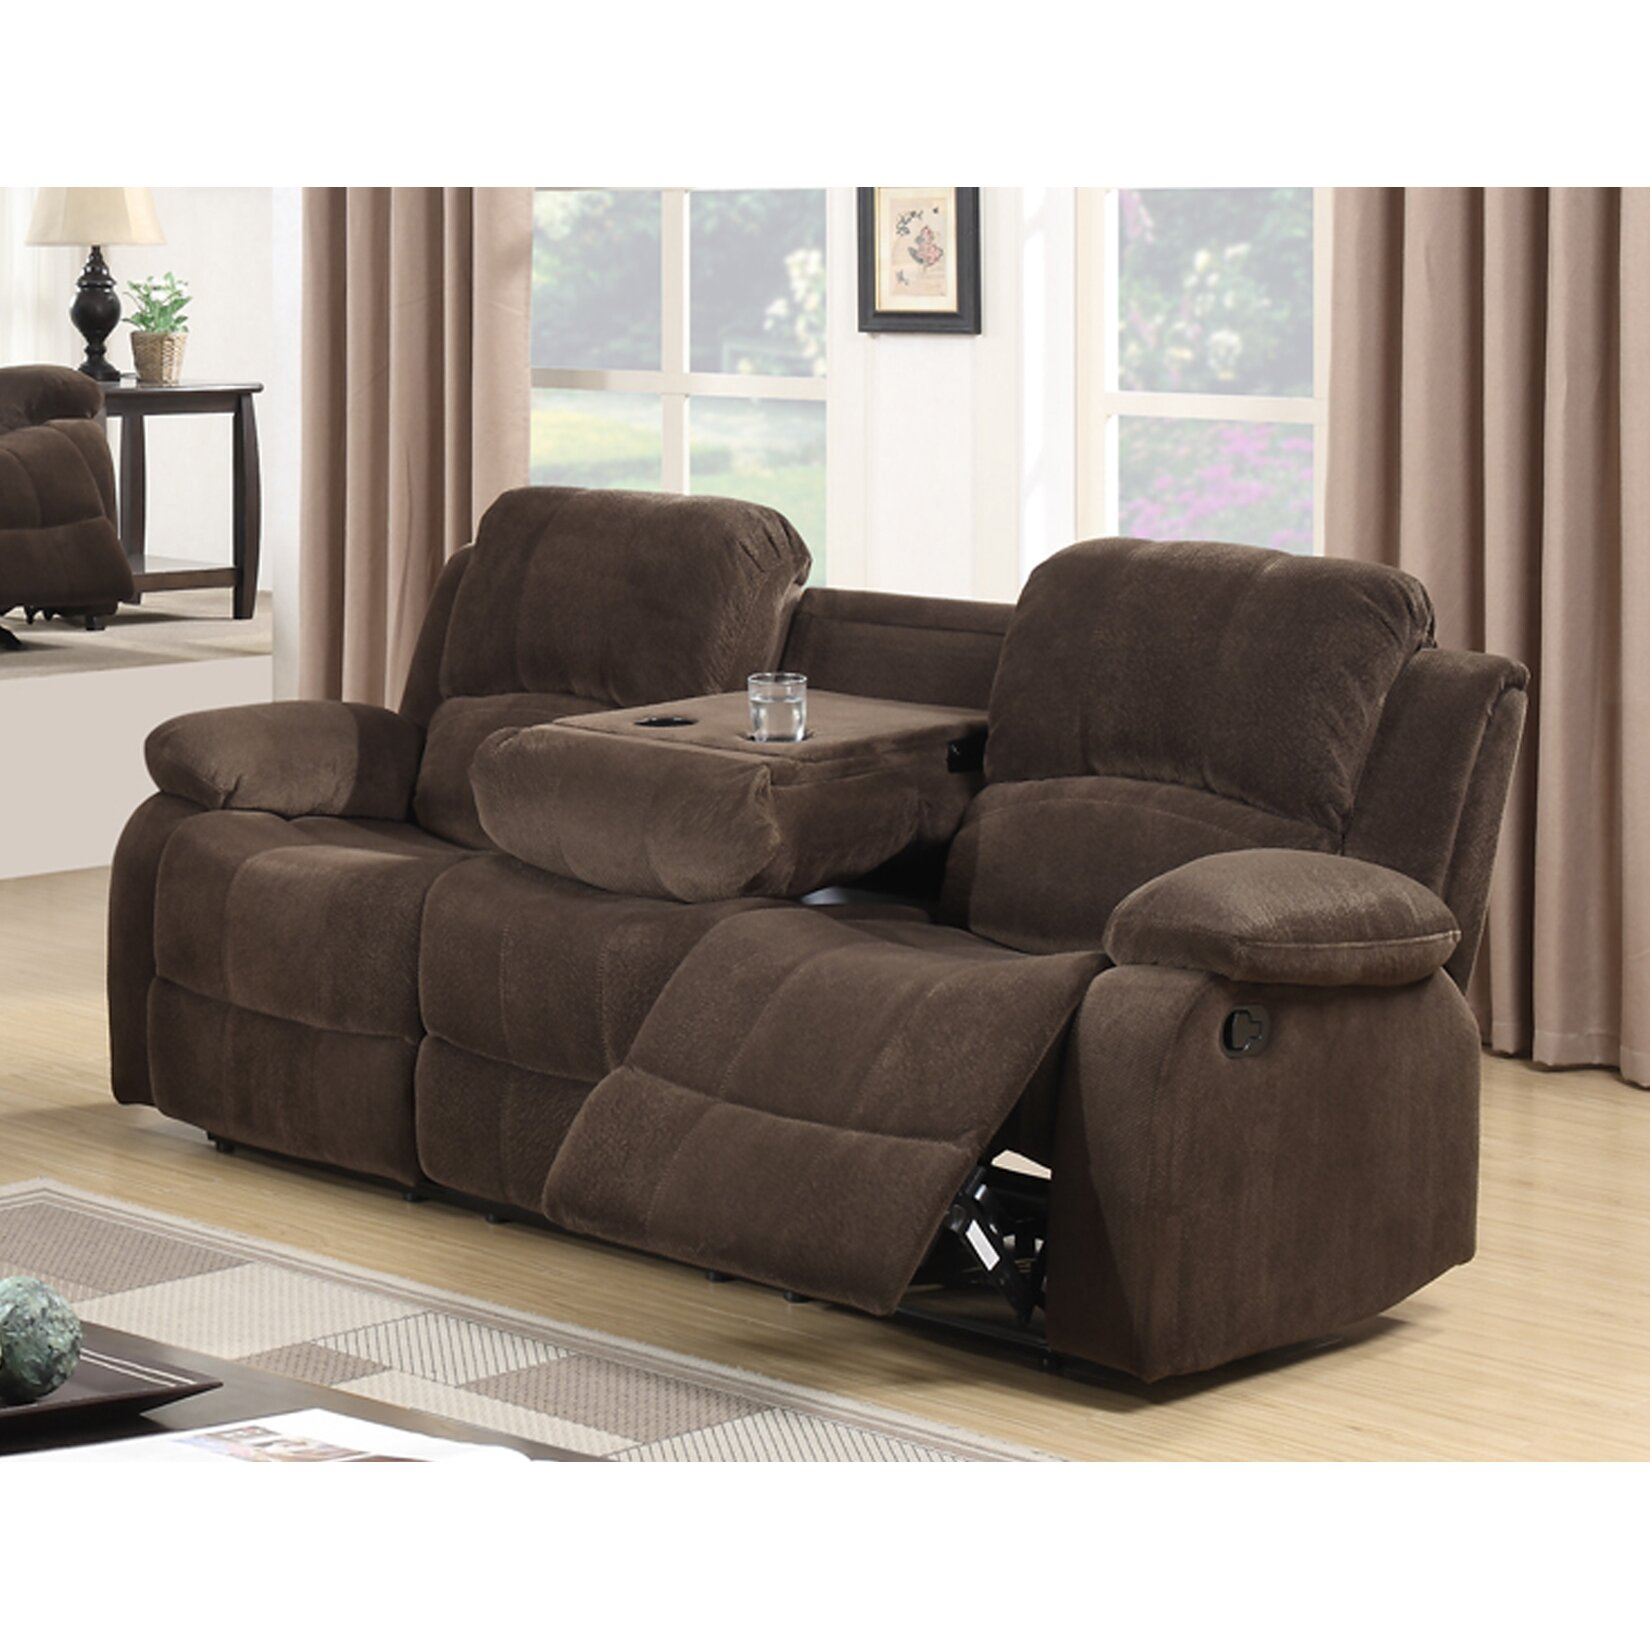 Best Quality Reclining Sofa Hereo Sofa